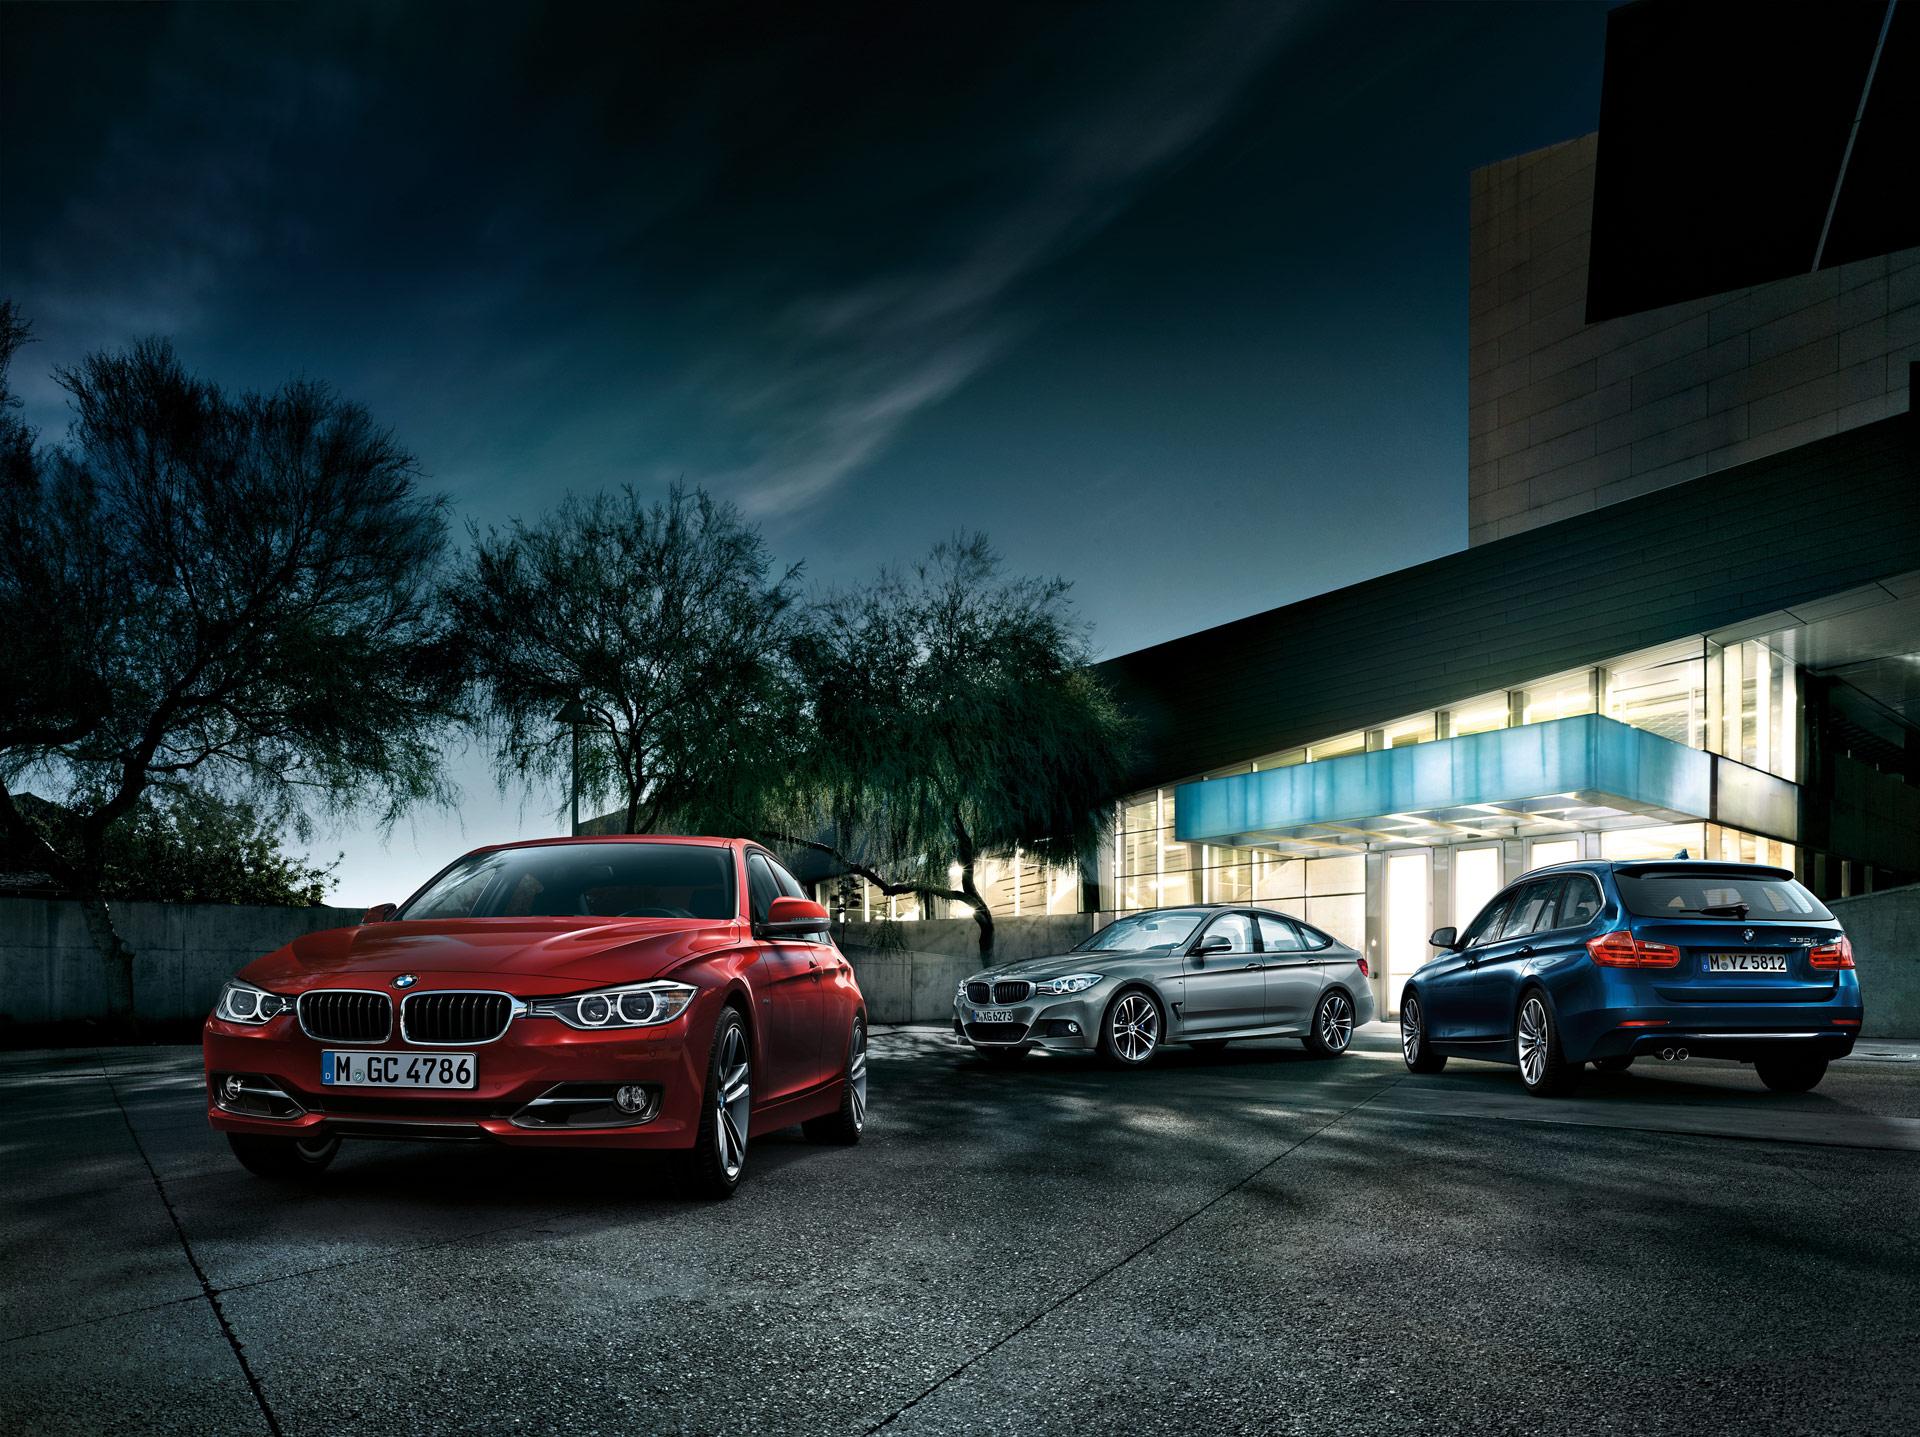 2013 bmw 3 series gran turismo news and information 2014 BMW 320I Black